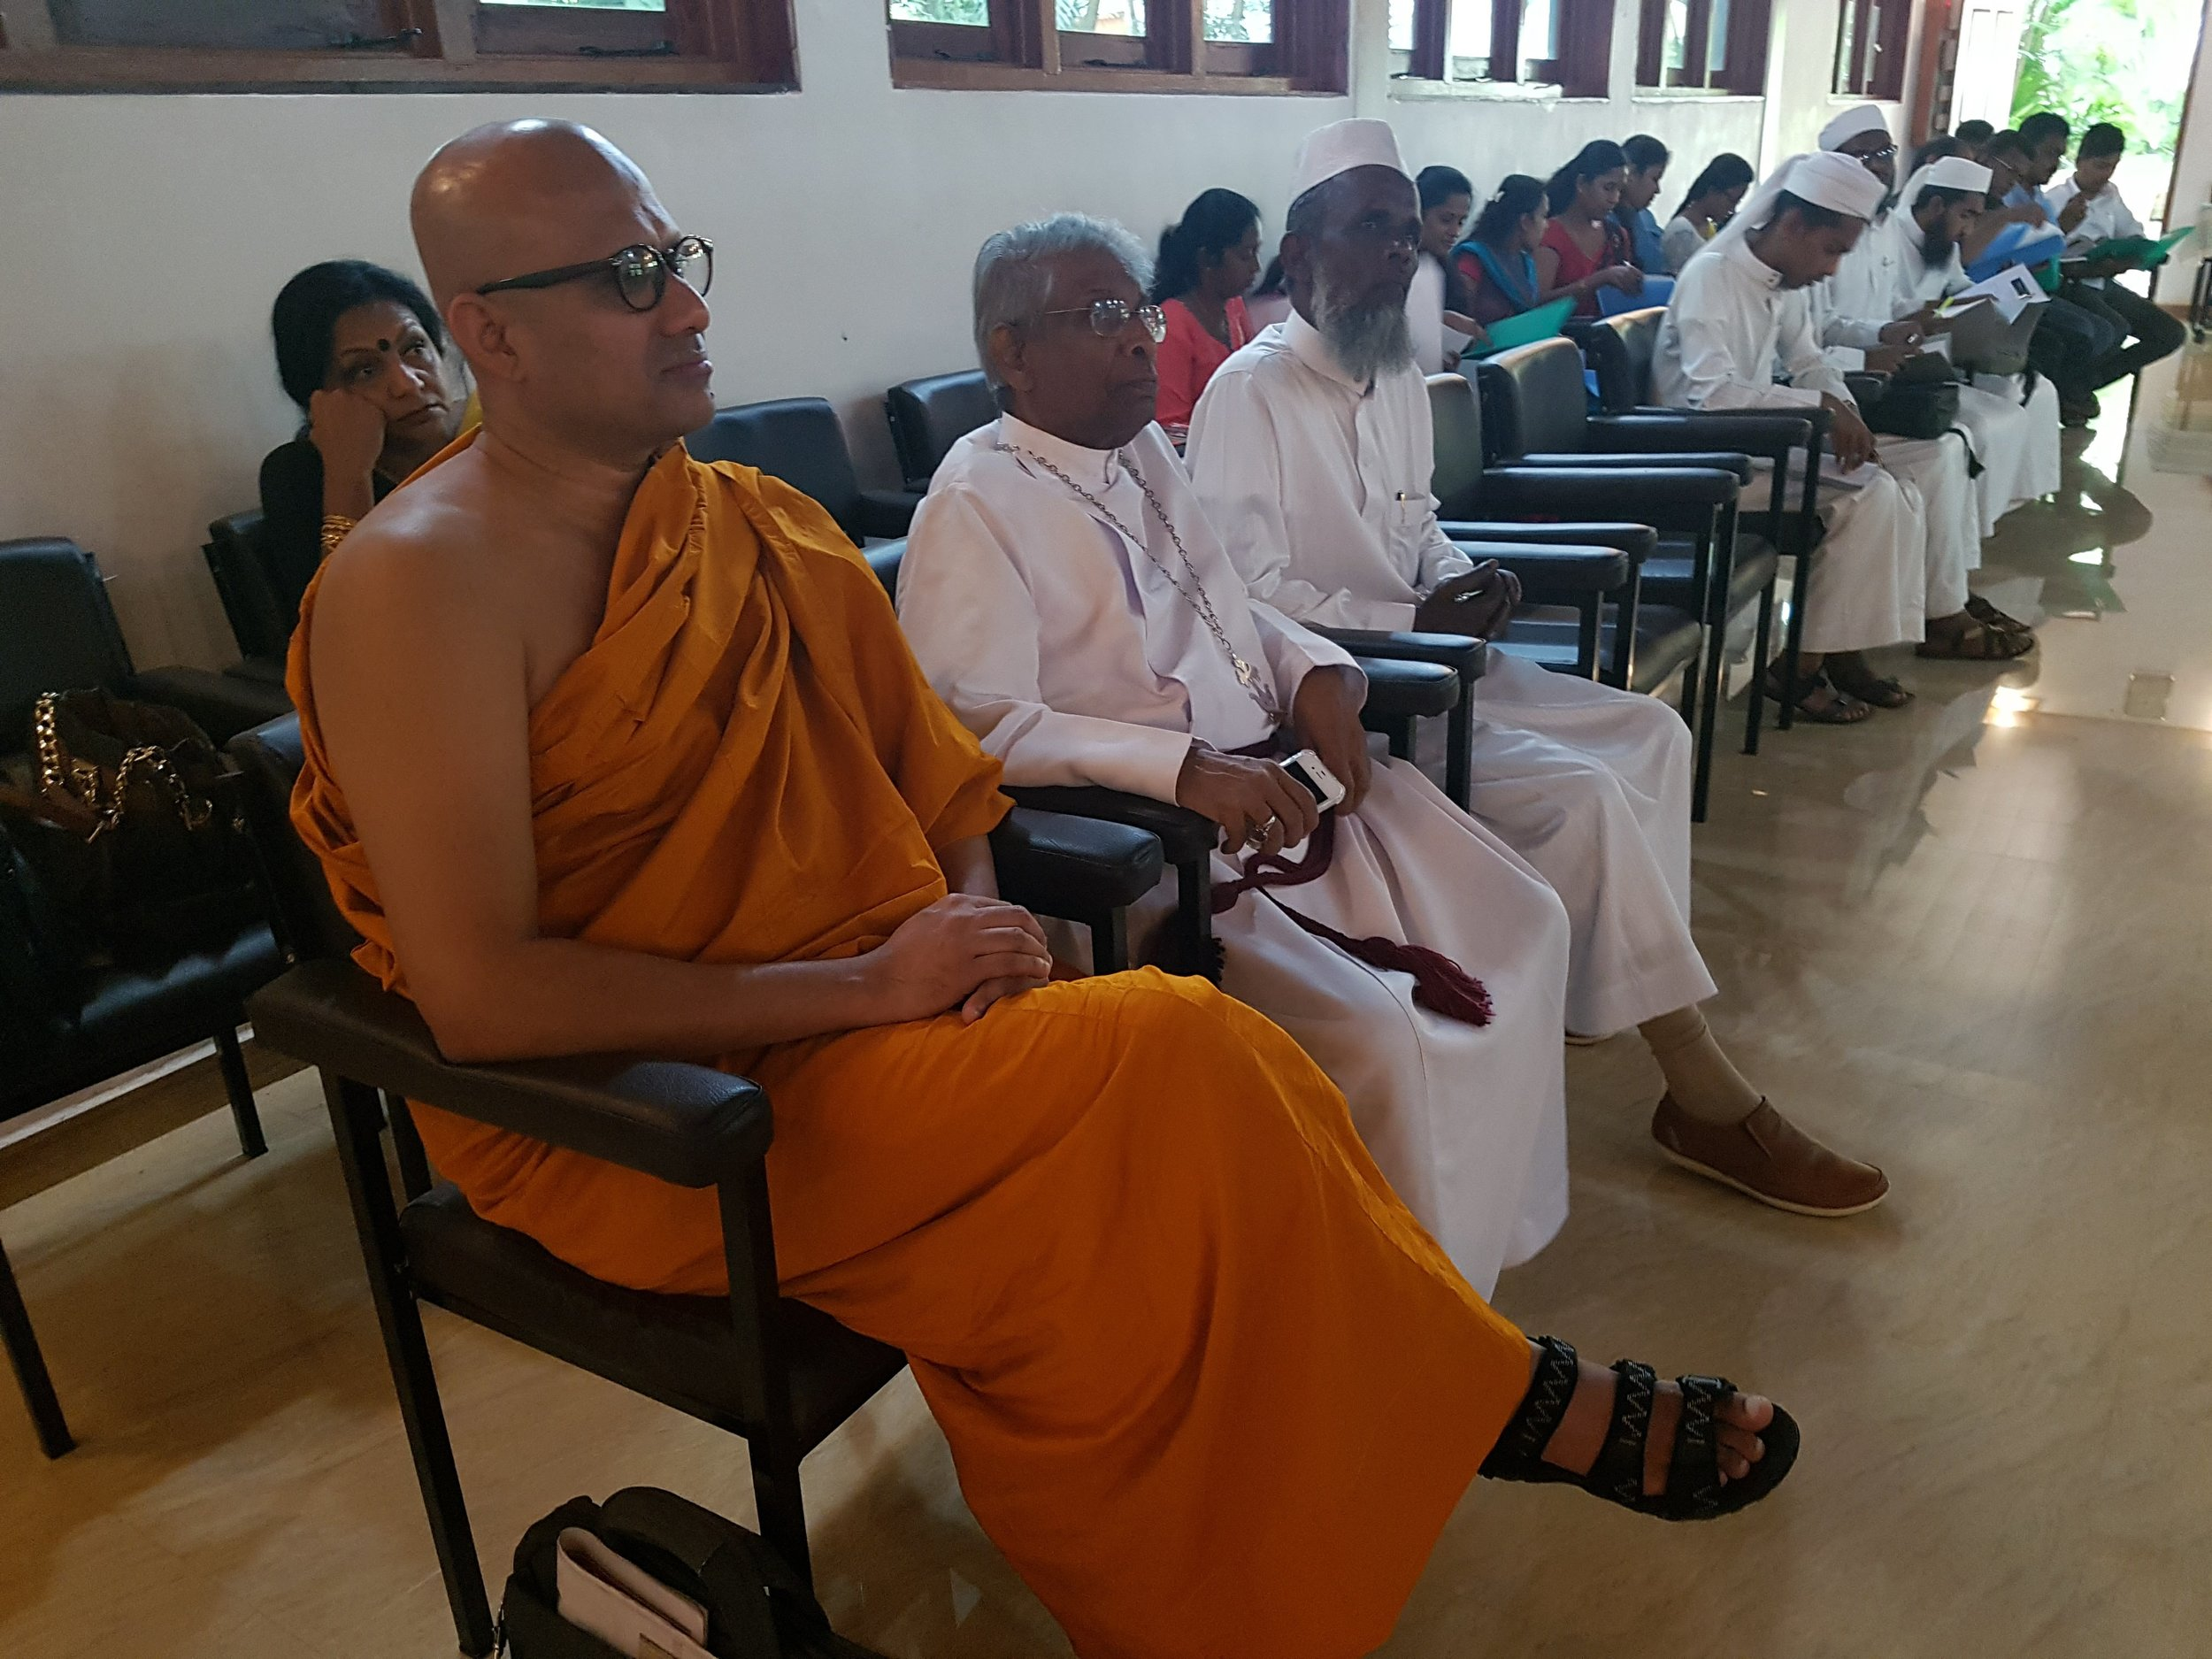 Buddhist, Christian, and Muslim leader at OMNIA Leadership Training Event in Kandy, Sri Lanka